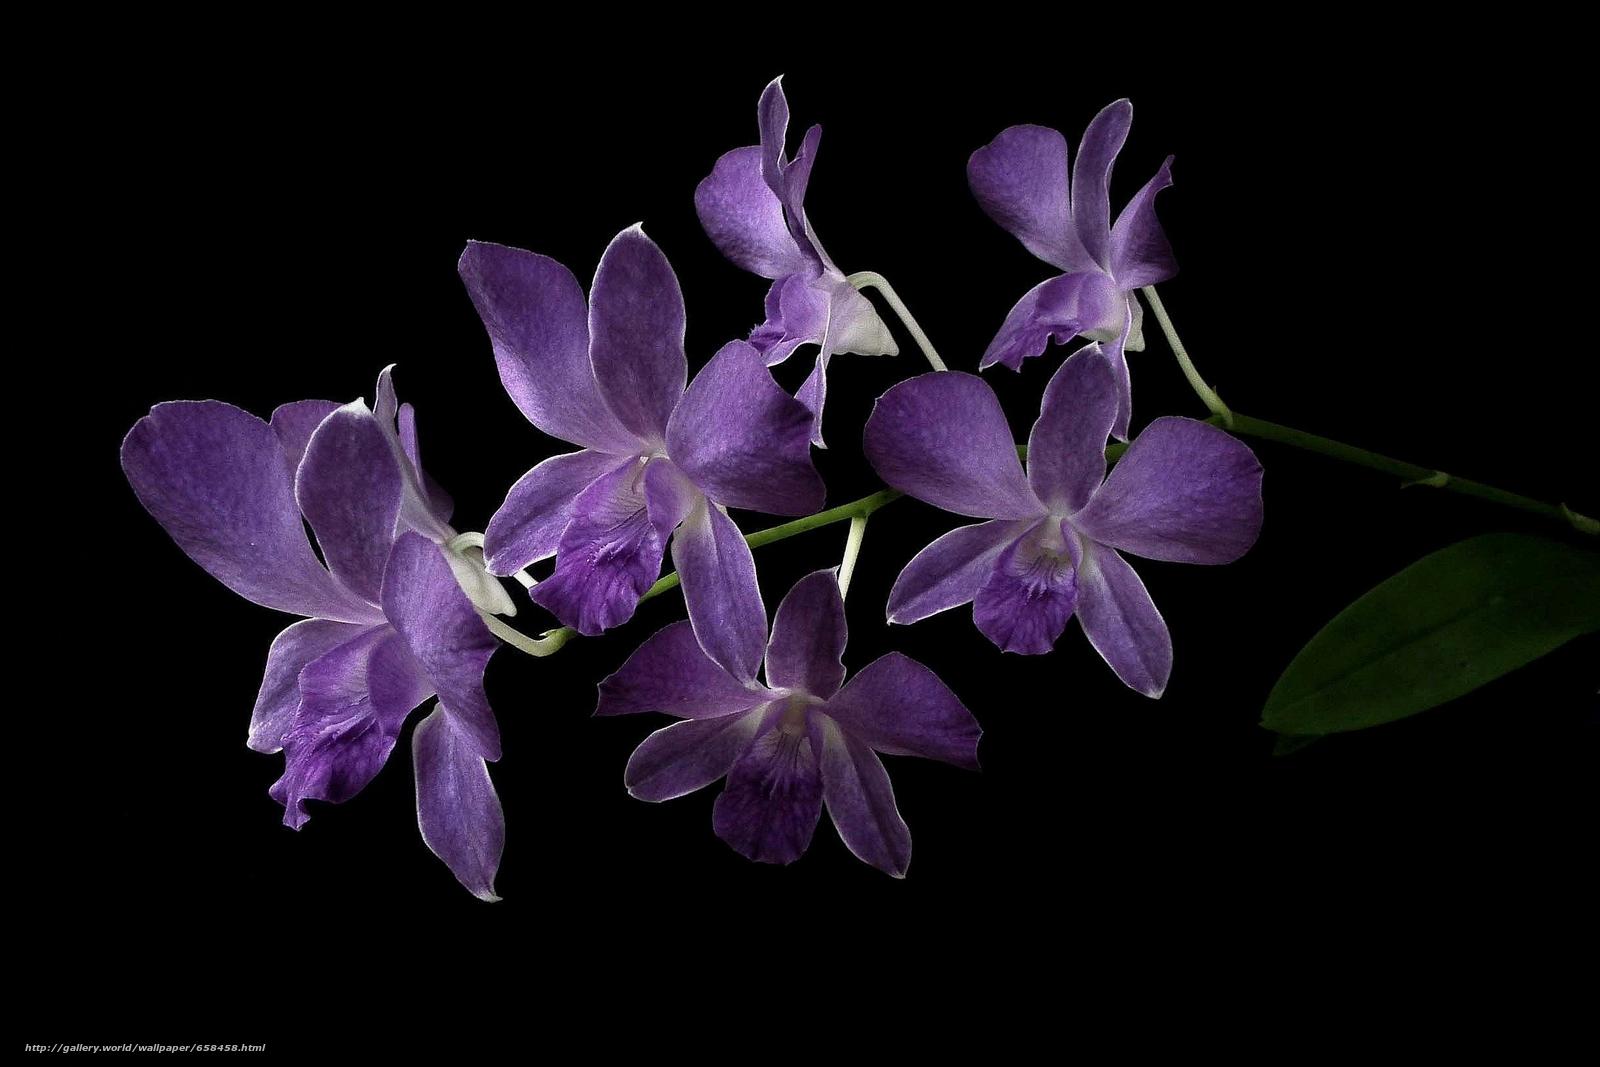 Download wallpaper flower,  Flowers,  flora free desktop wallpaper in the resolution 2448x1632 — picture №658458